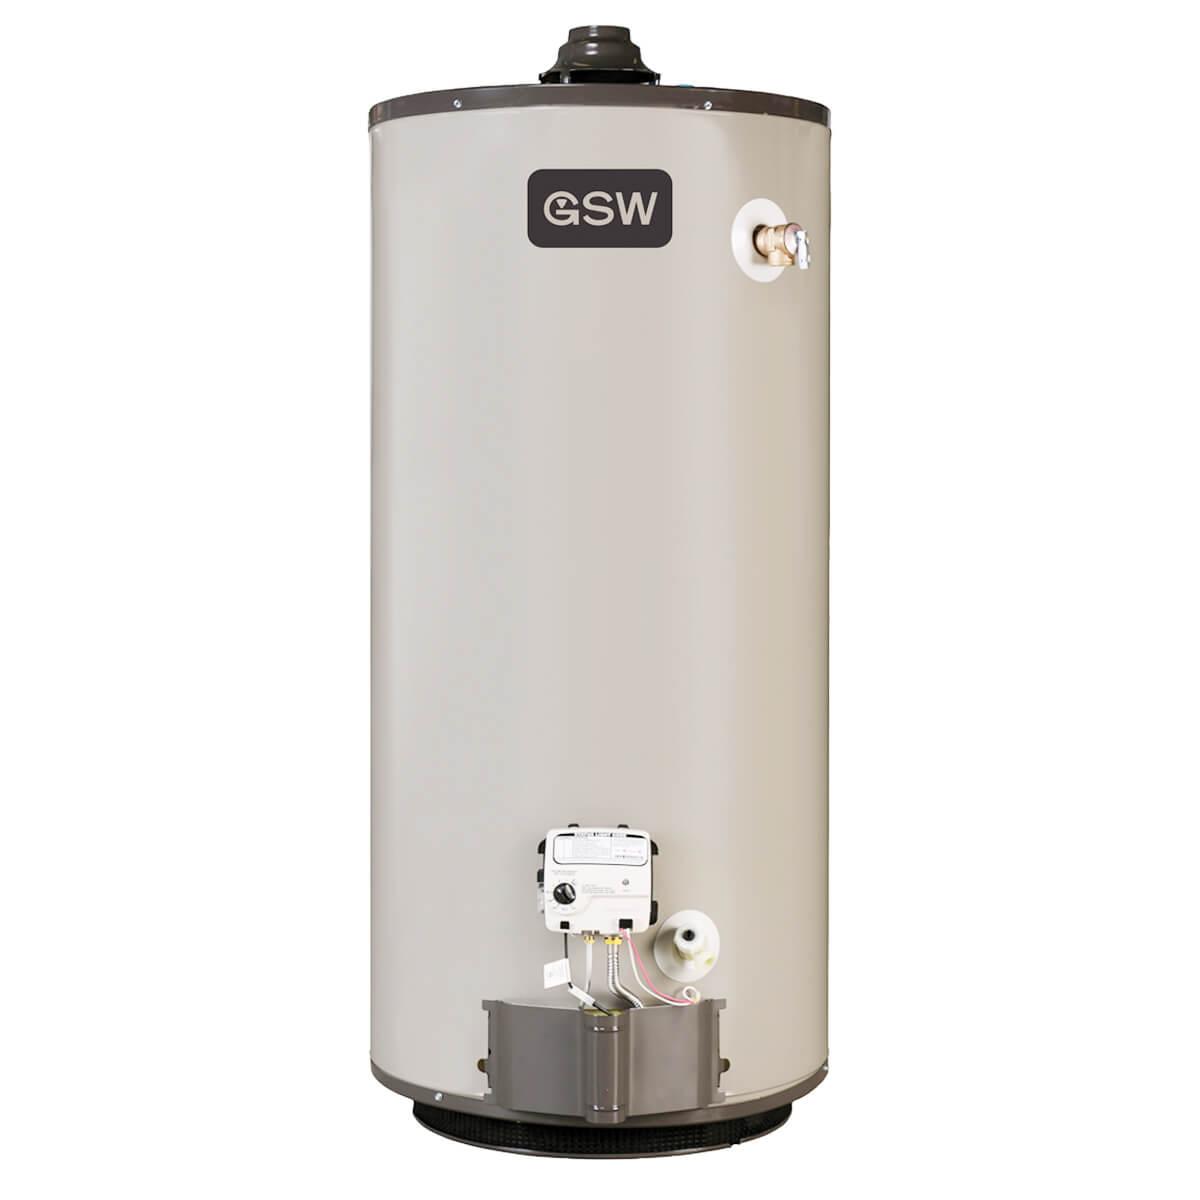 40 Gal Propane Hot Water Tank